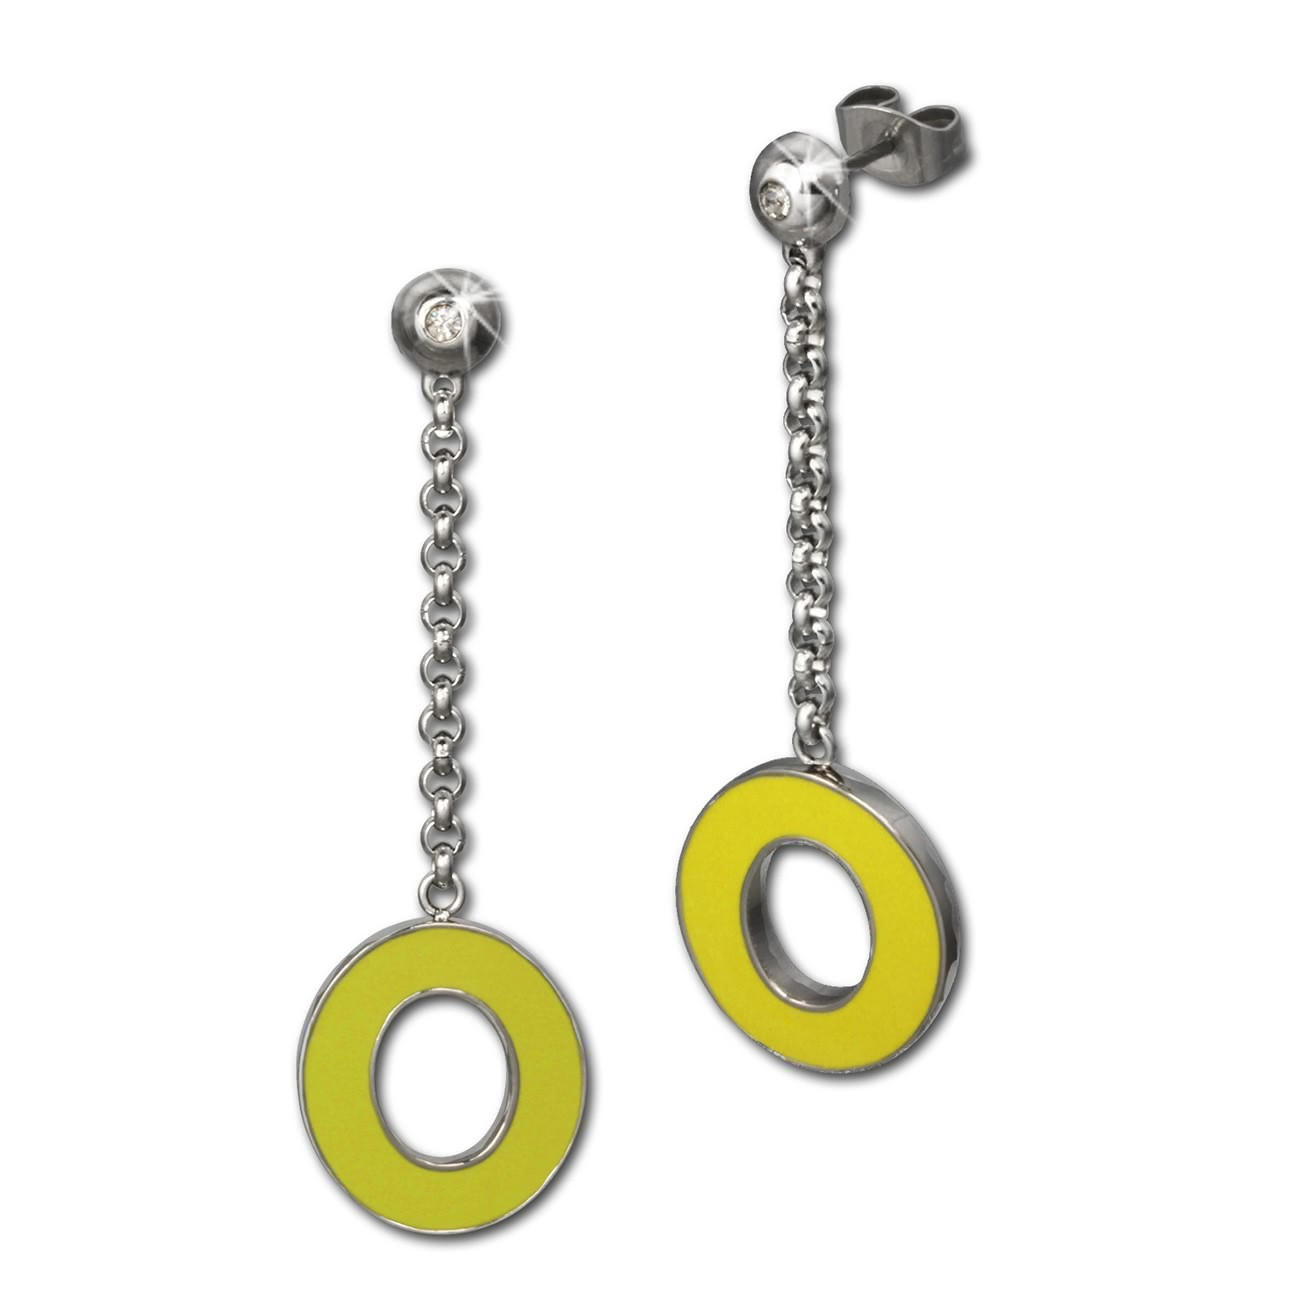 Amello Ohrstecker Oval Zirkonia Emaille gelb Ohrringe Damen Stahl ESOG03Y